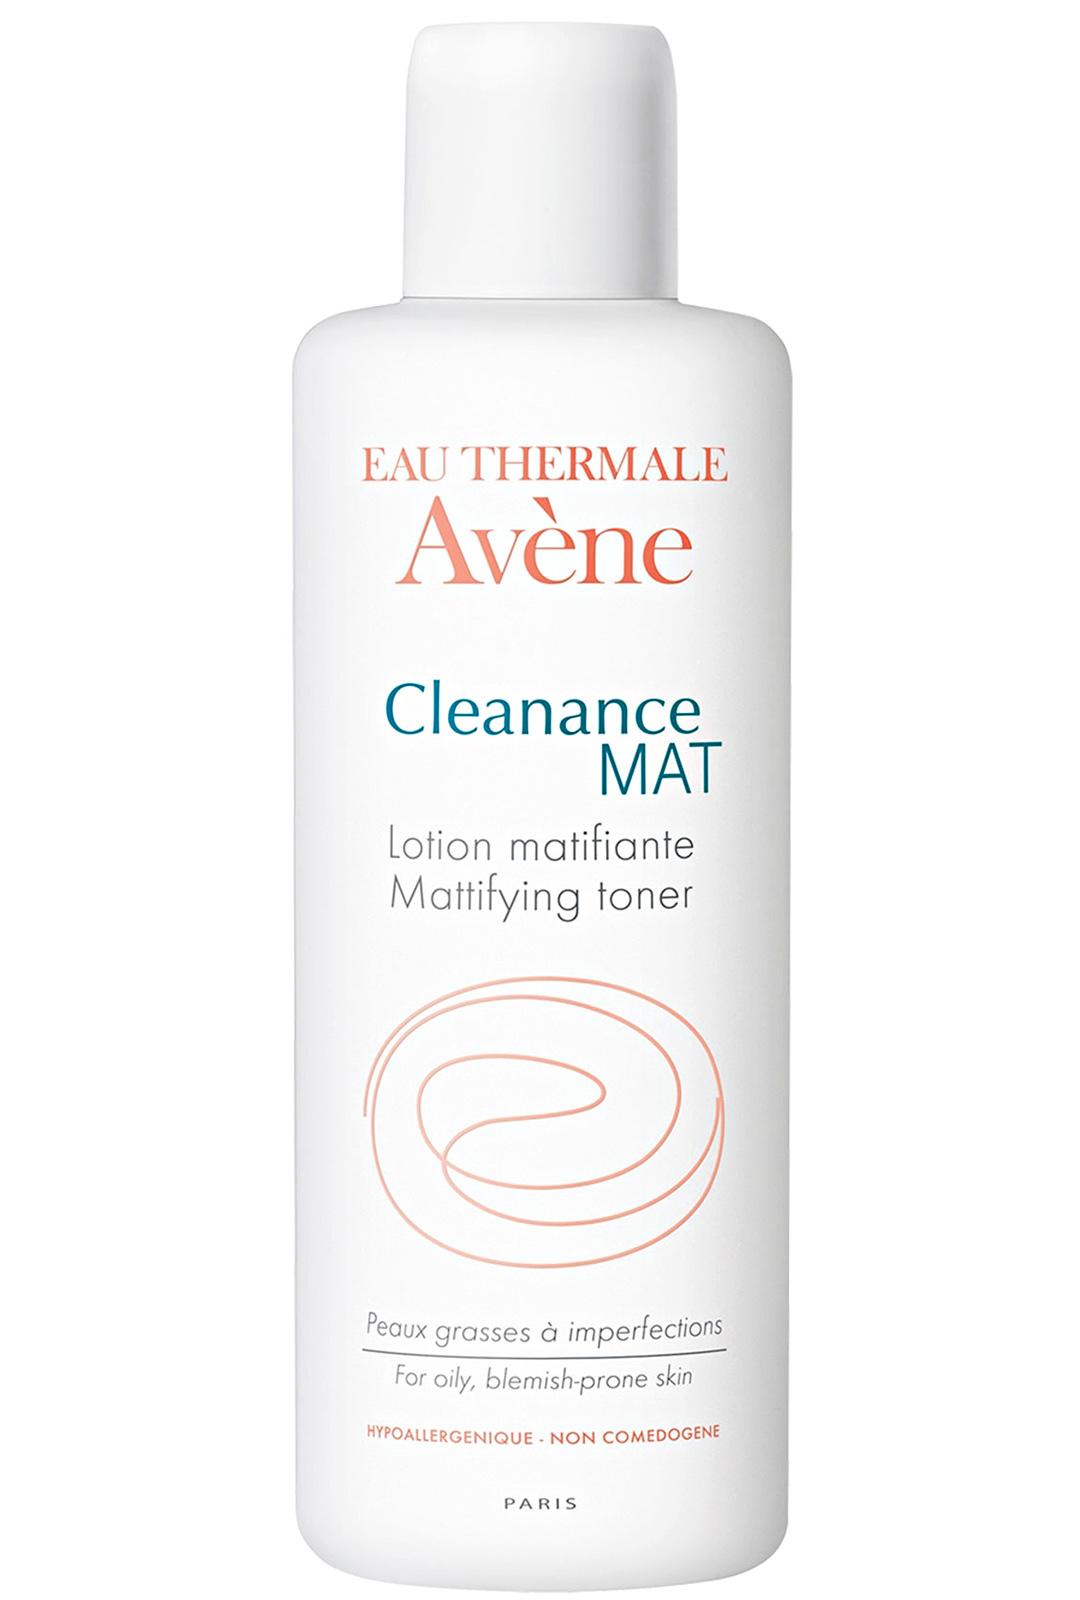 Avène Cleanance Mat Mattifying Toner, n. 17 €/200 ml.